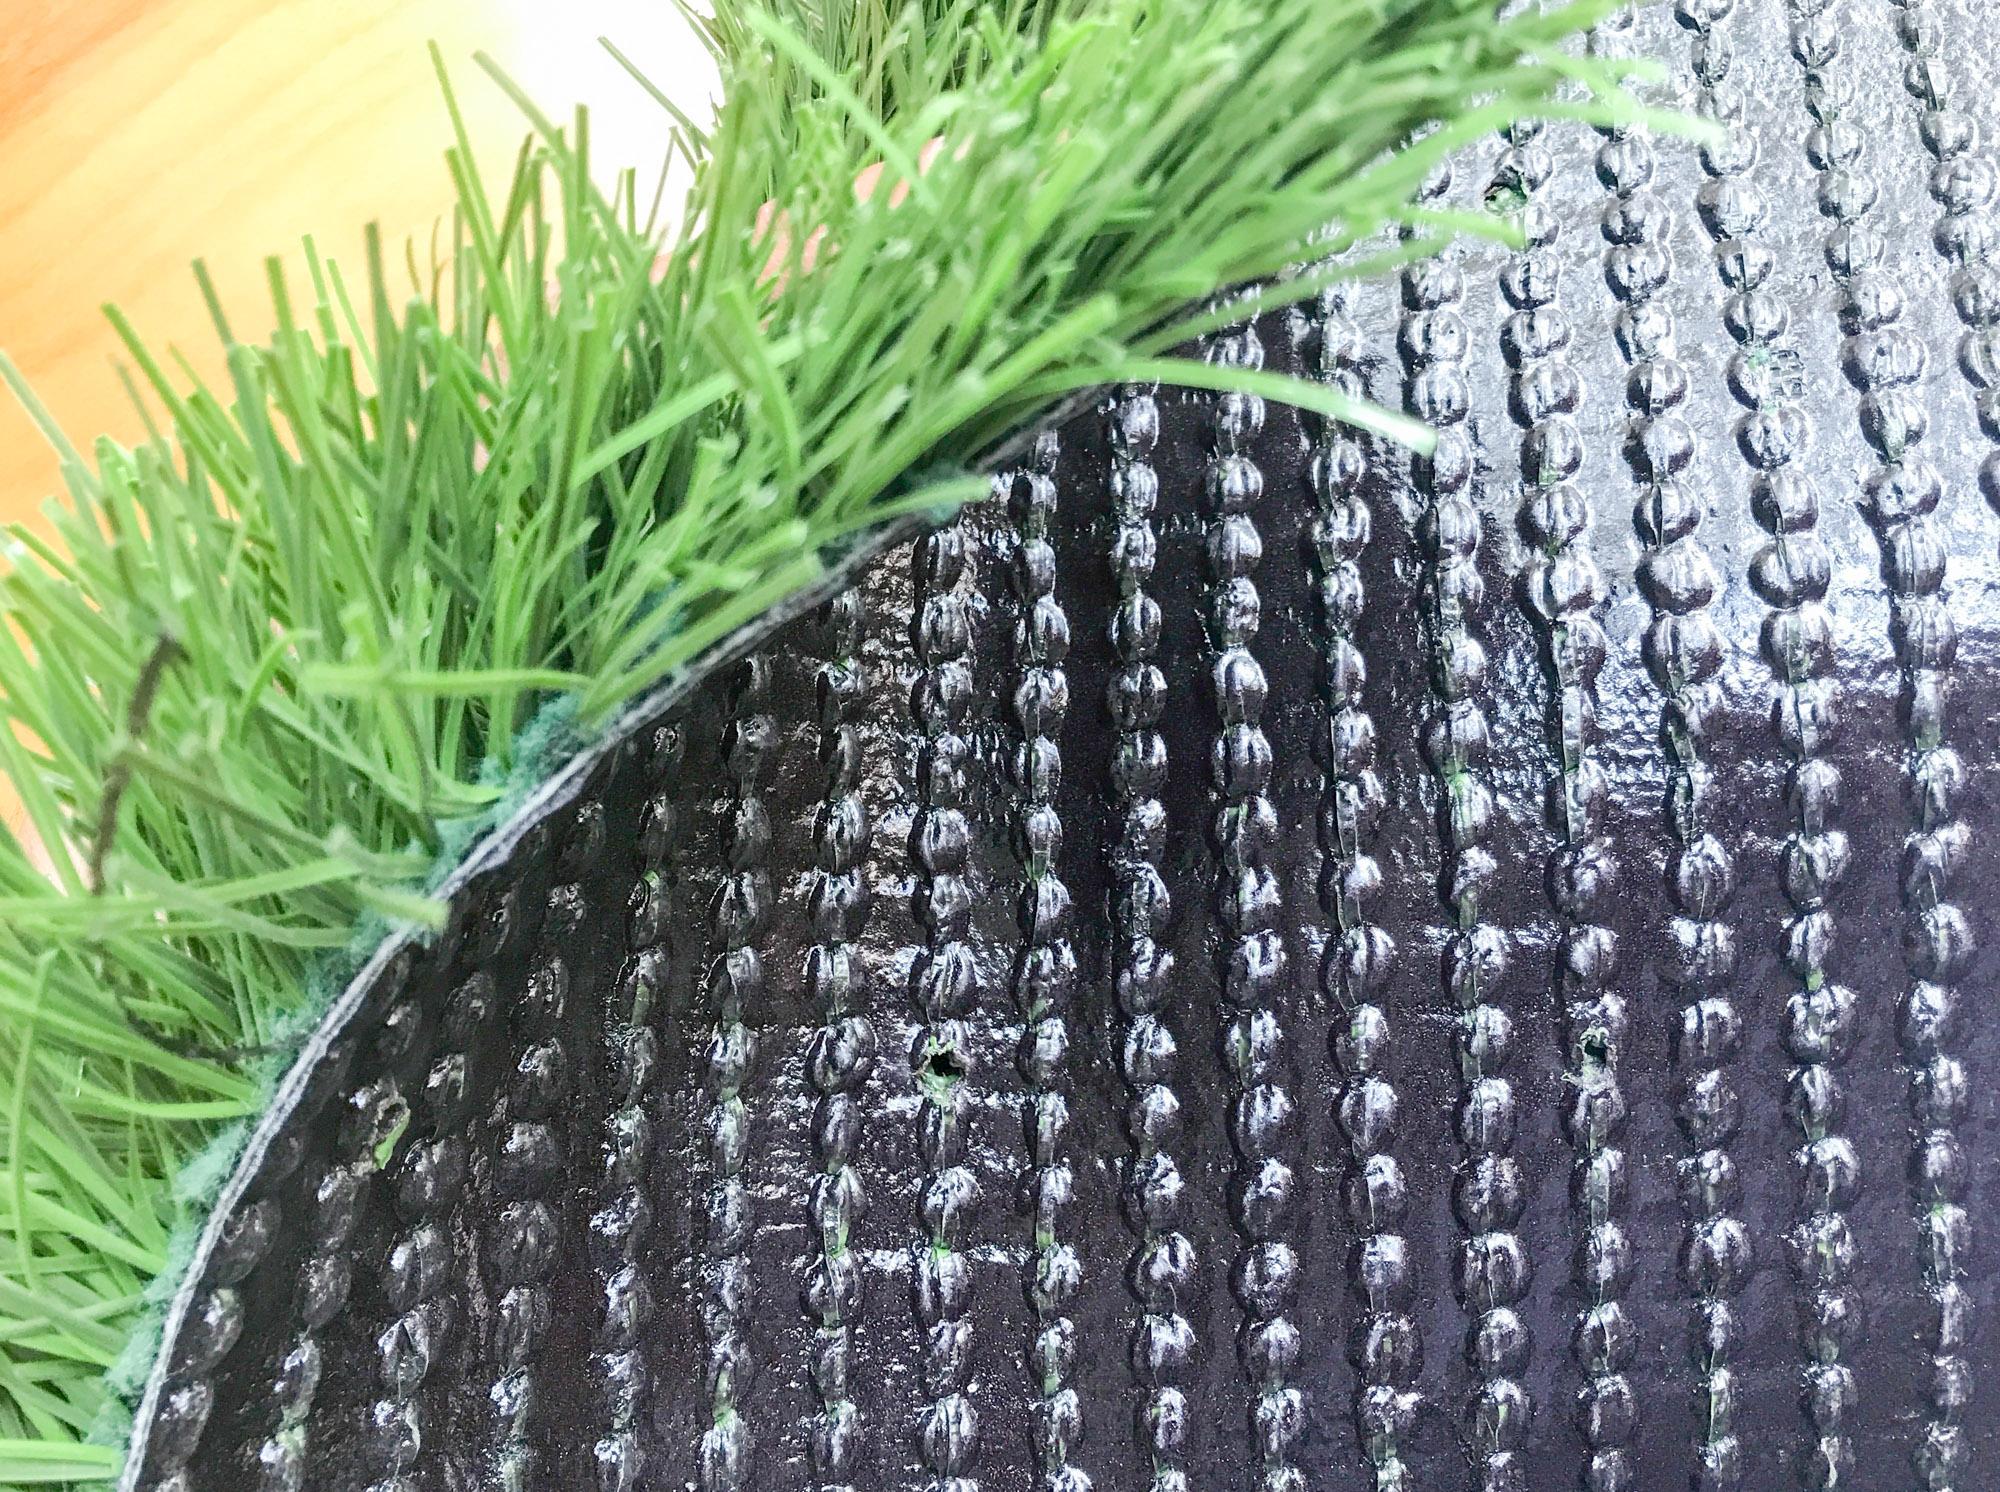 Backing of synthetic turf